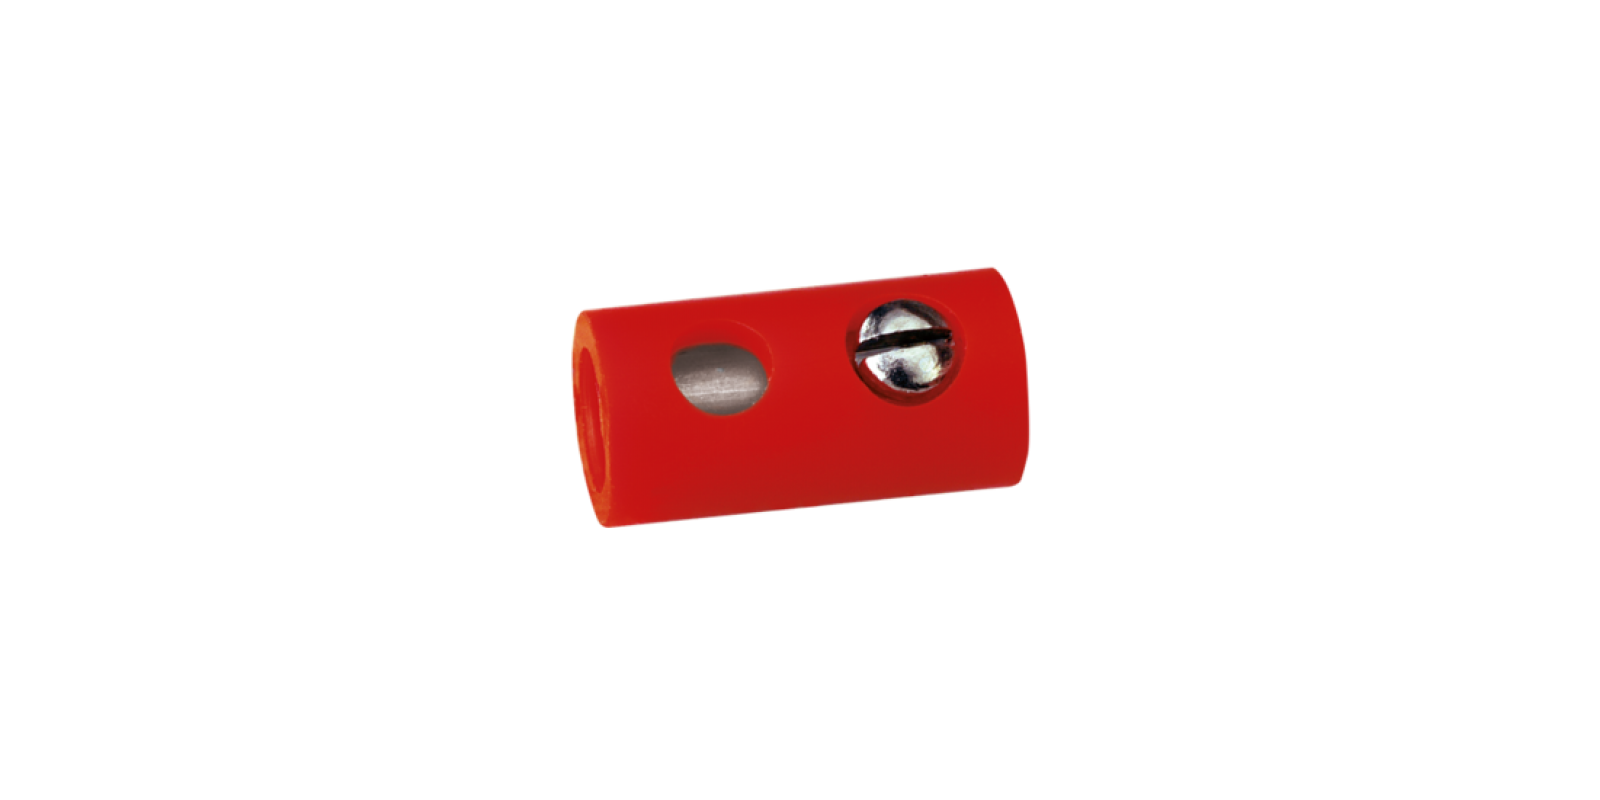 BR3042 SOCKETS, ∅ 2.5 MM, RED